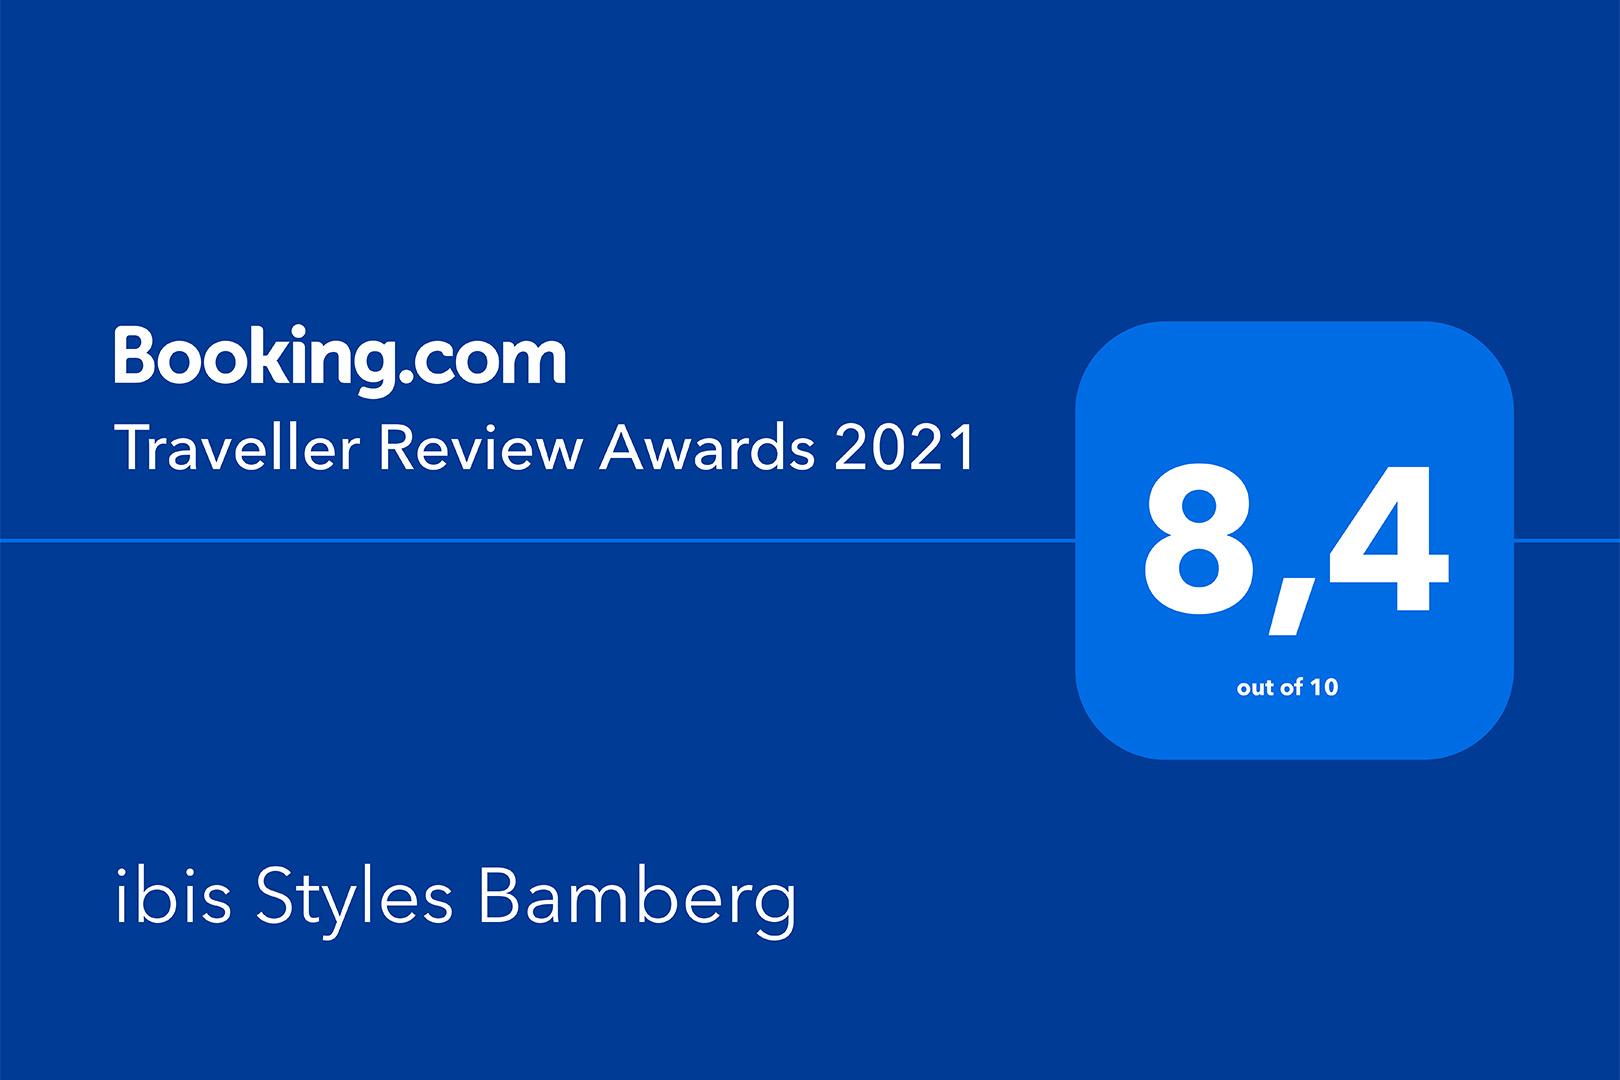 ibis Styles Bamberg - Traveller Review Award 2021